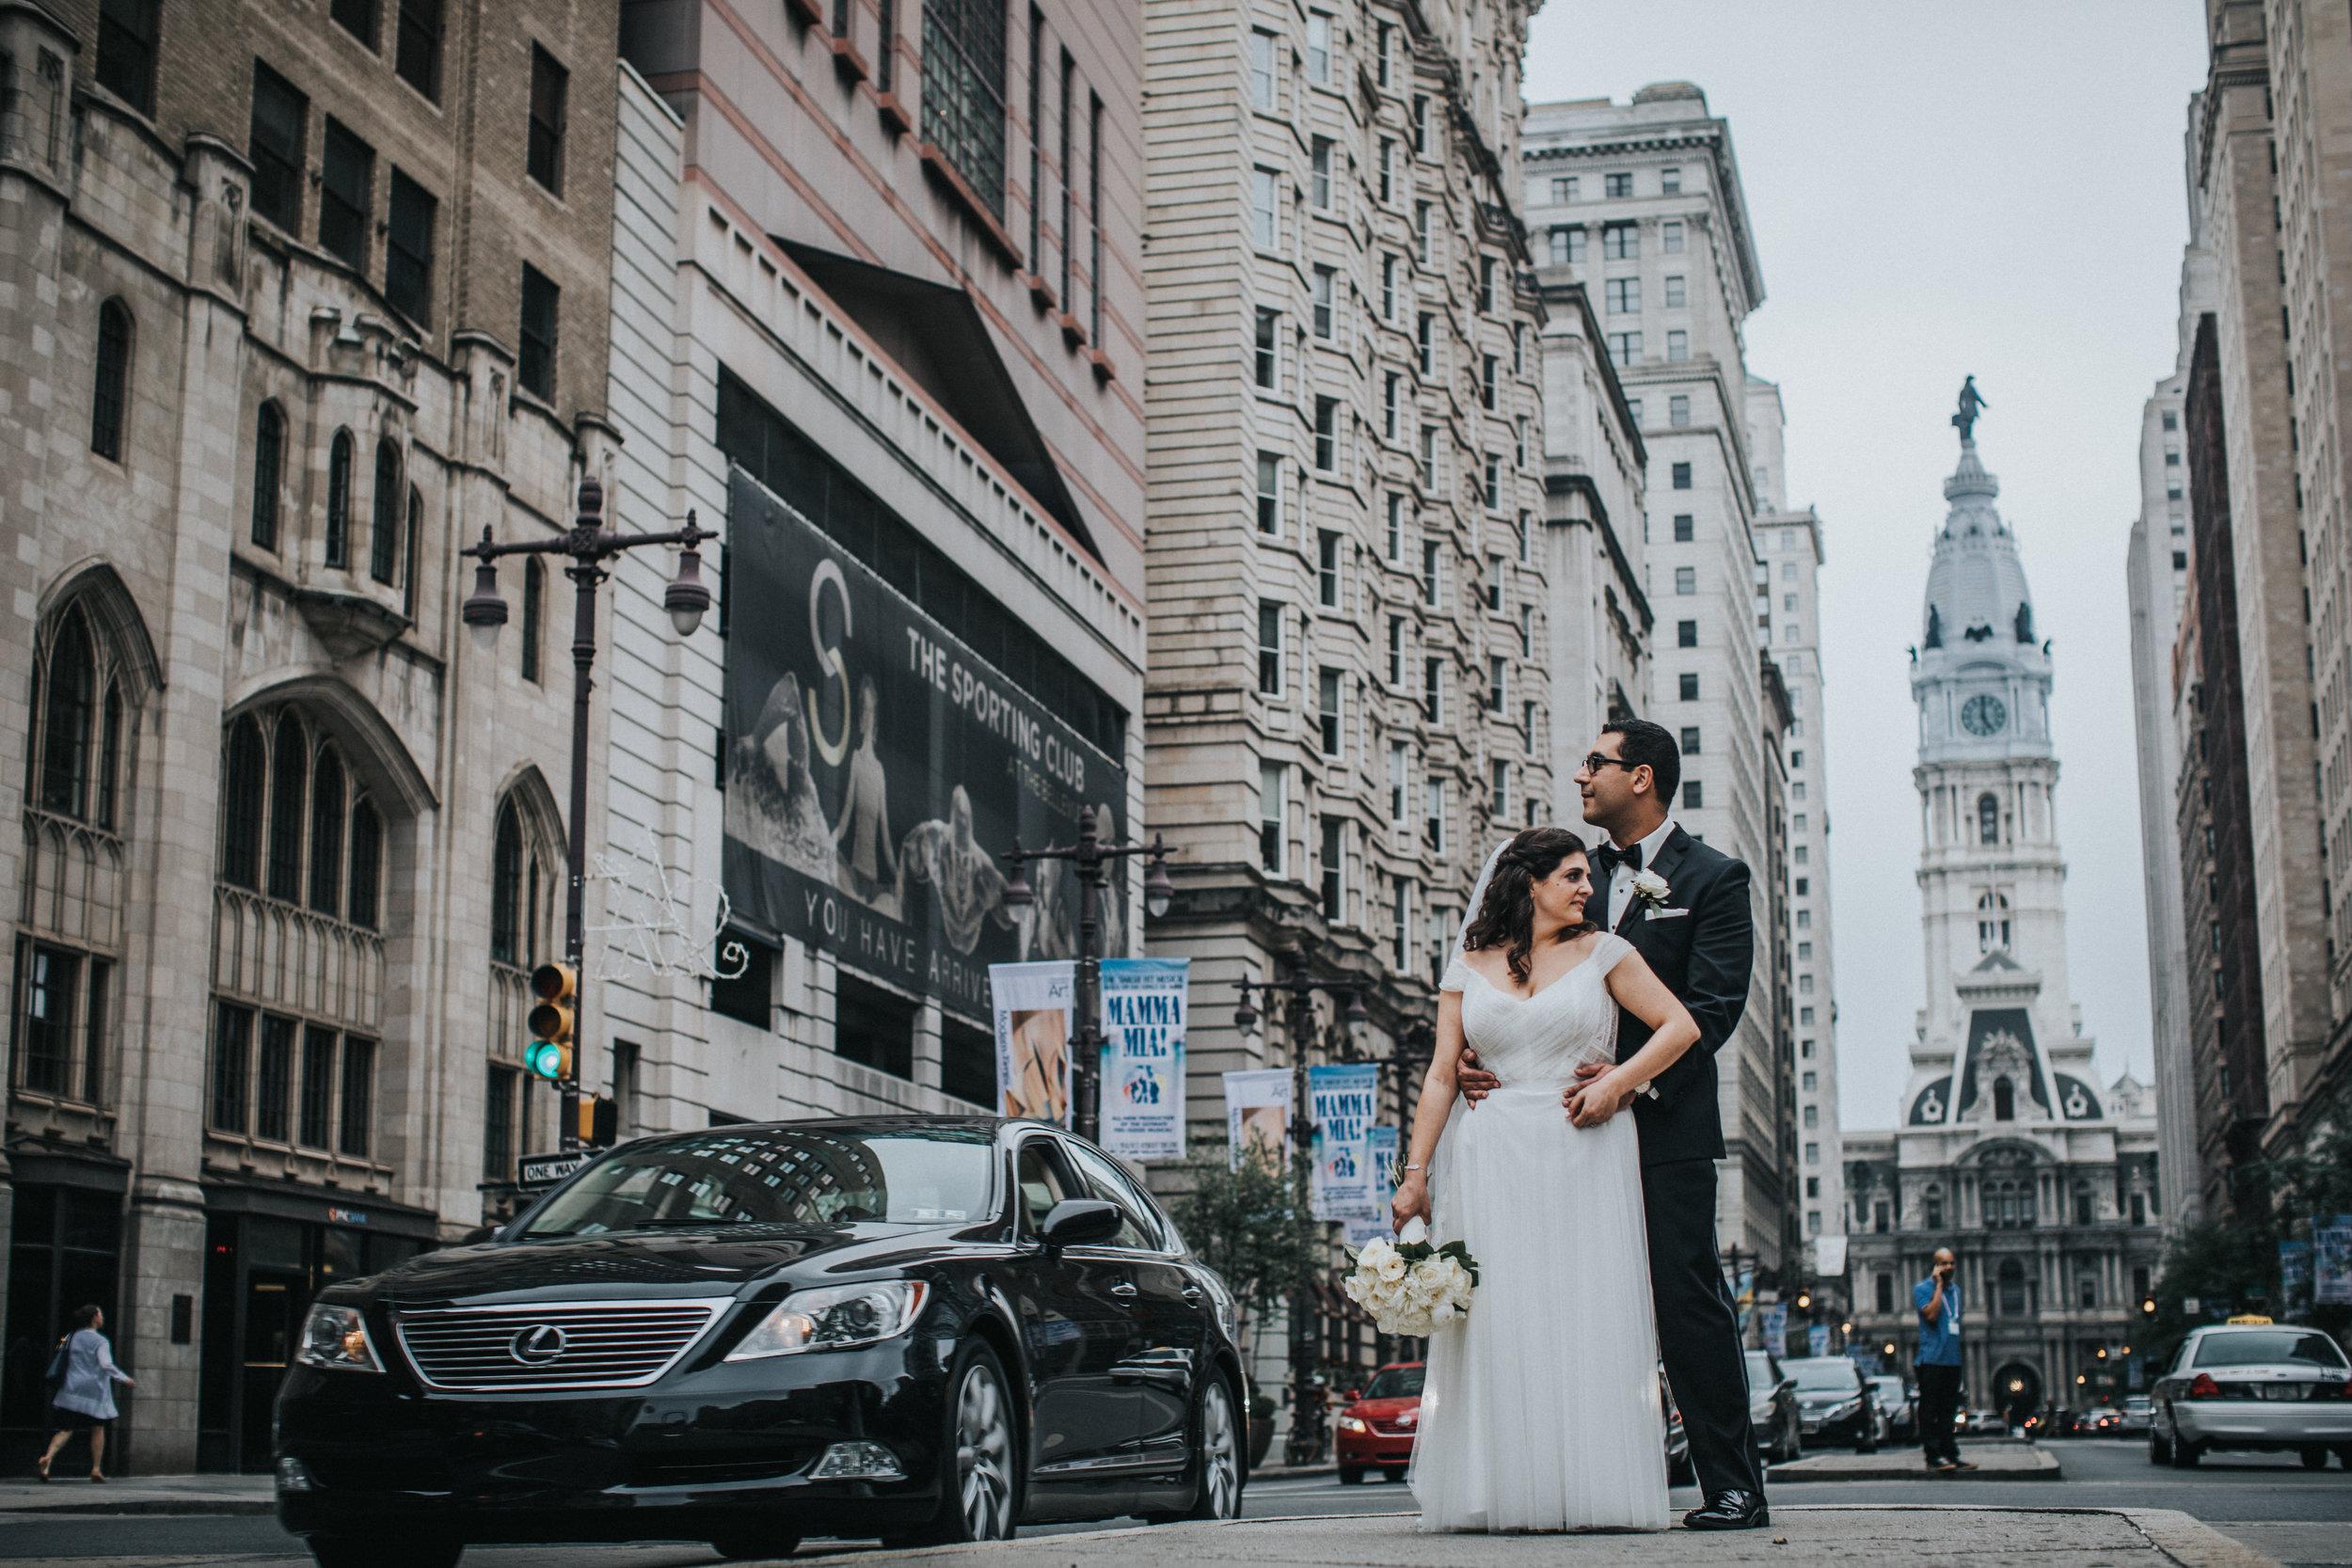 JennaLynnPhotography-NJWeddingPhotographer-Philadelphia-Wedding-ArtsBallroom-BridalParty-72.jpg